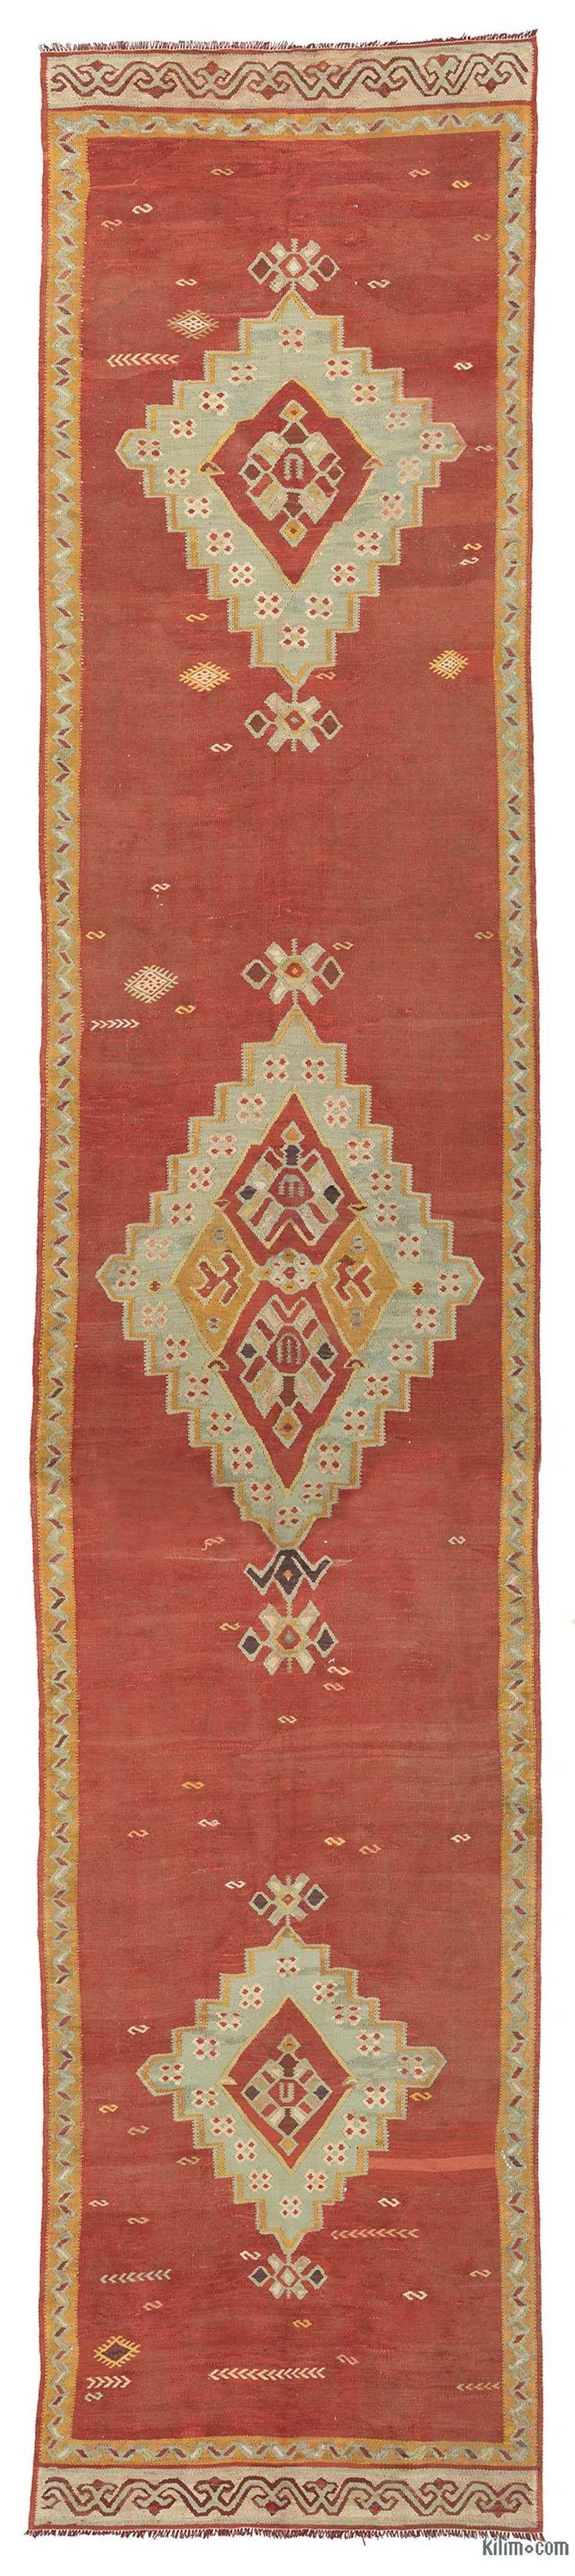 K0027853 Red Vintage Ushak Kilim Runner   Kilim Rugs, Overdyed Vintage Rugs, Hand-made Turkish Rugs, Patchwork Carpets by Kilim.com